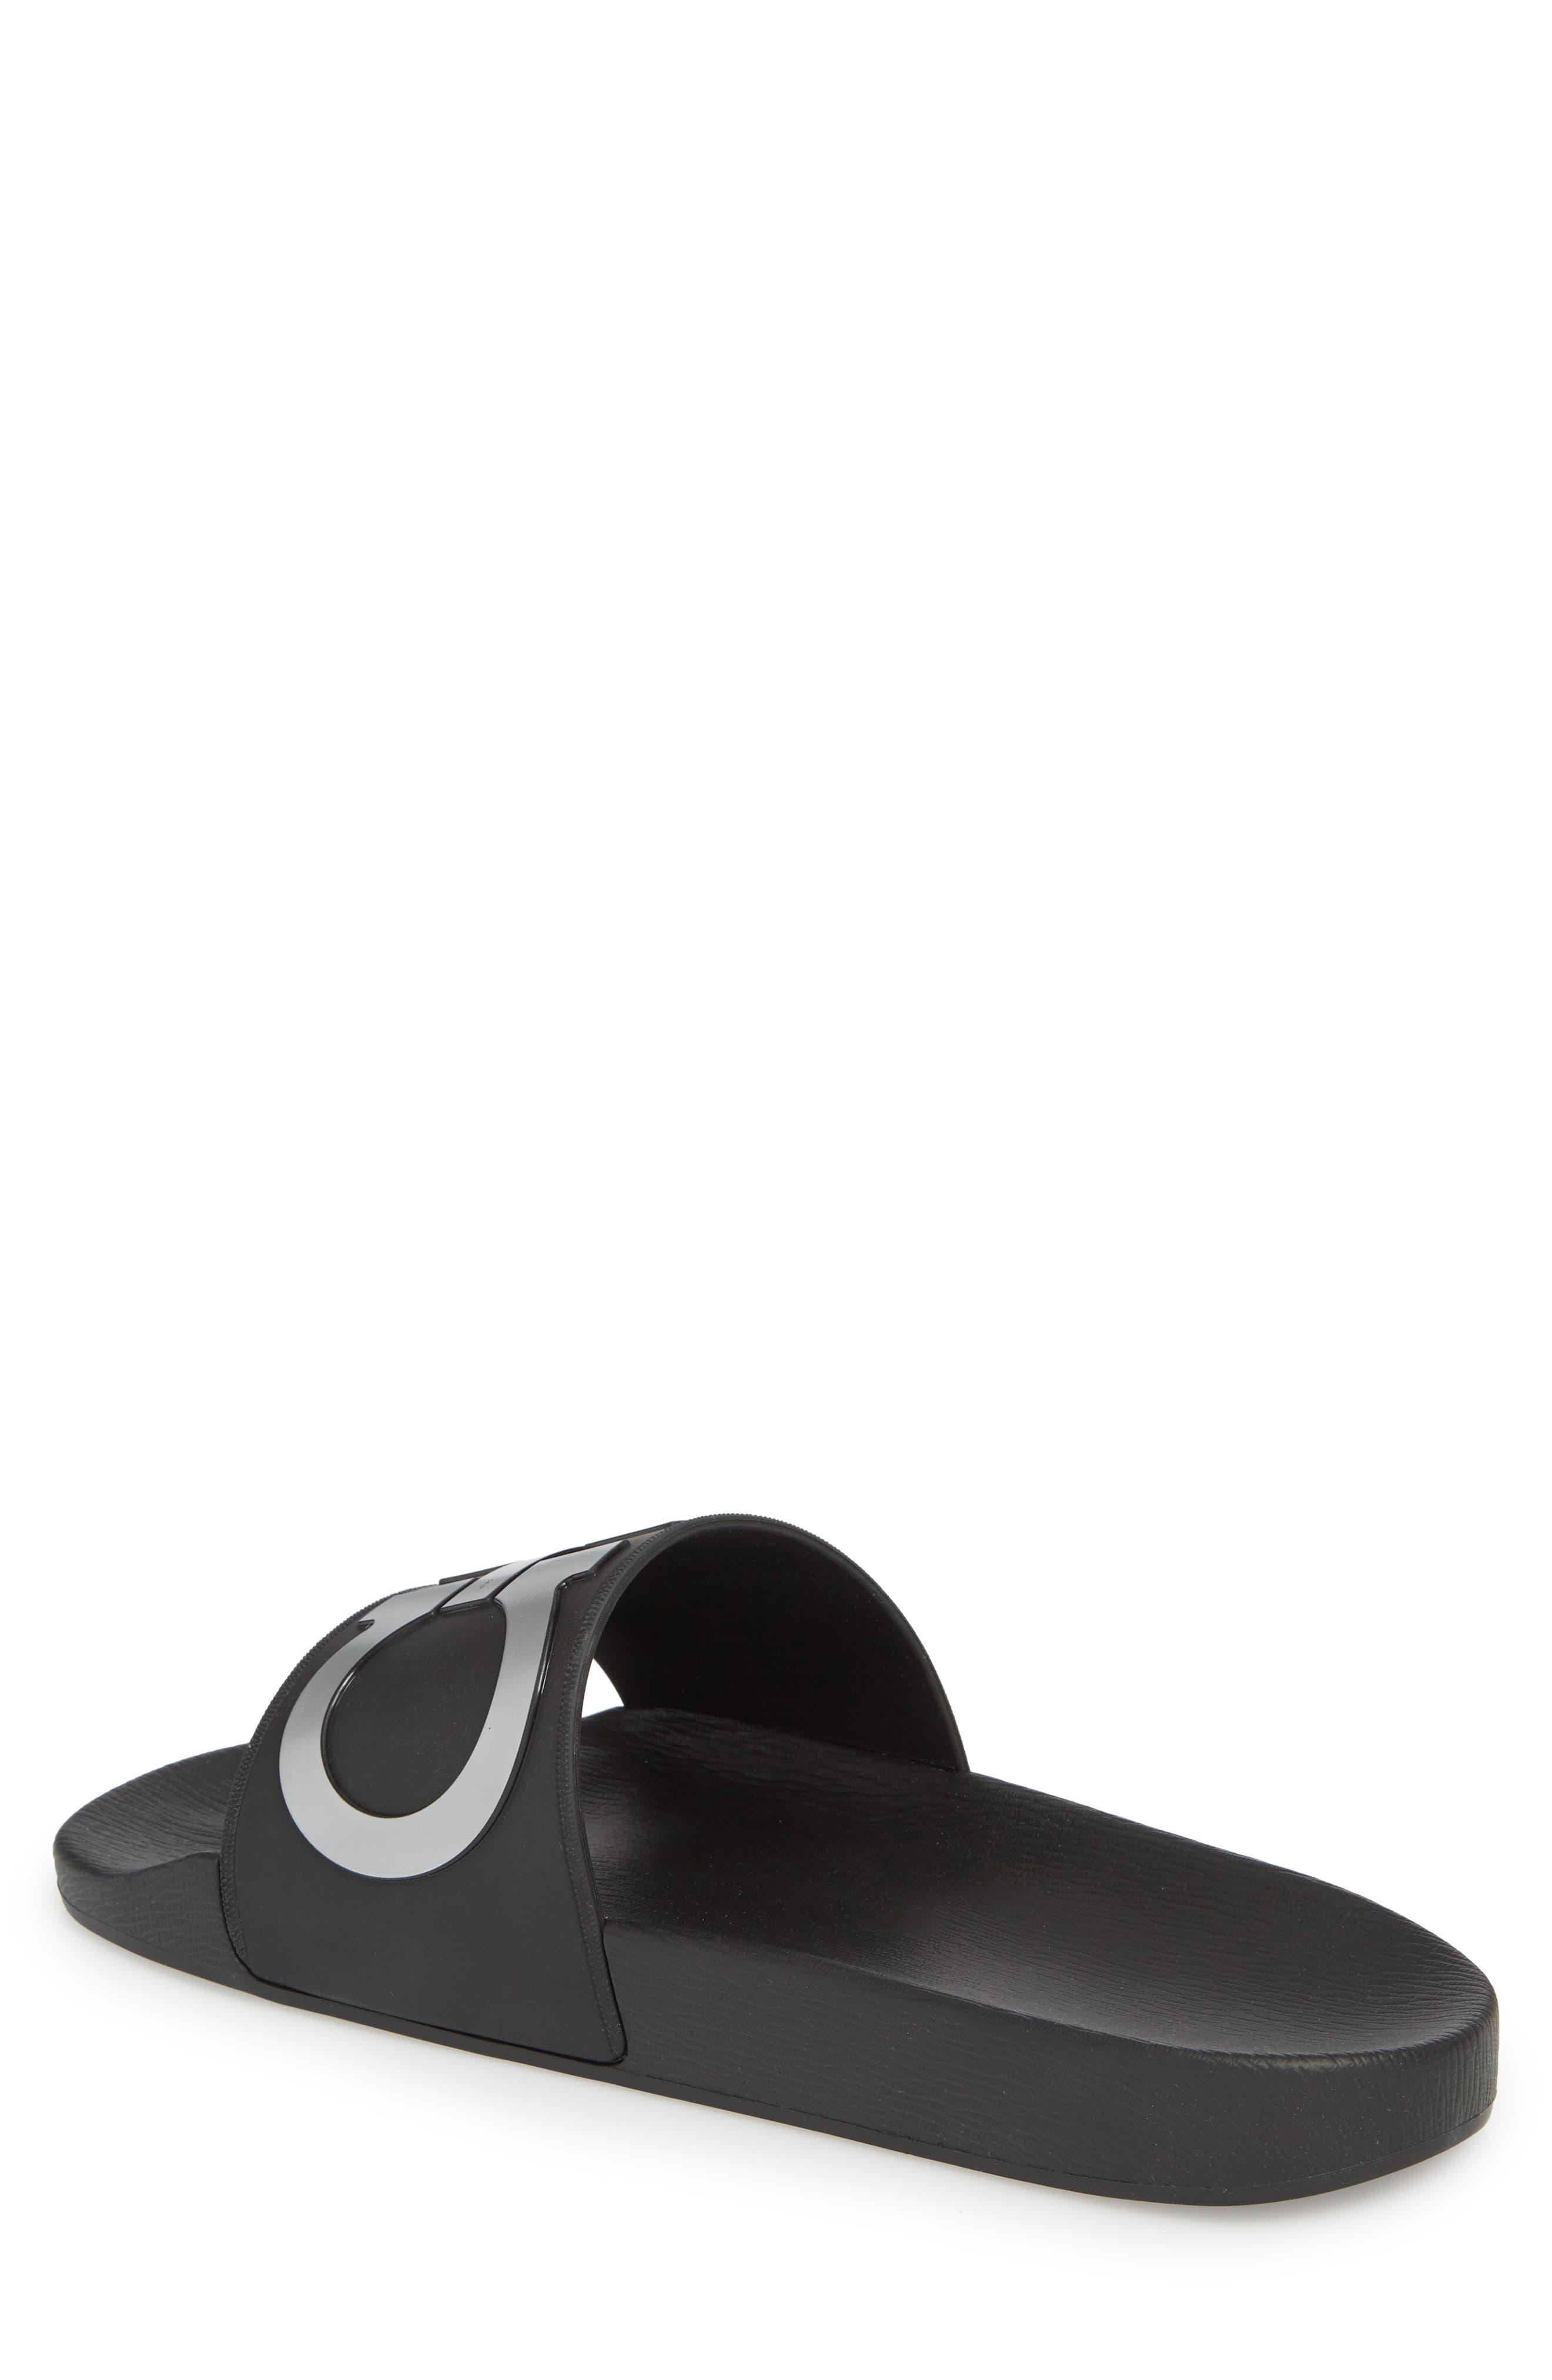 e902570cdd5f6b Salvatore Ferragamo Men s Slides Fashion